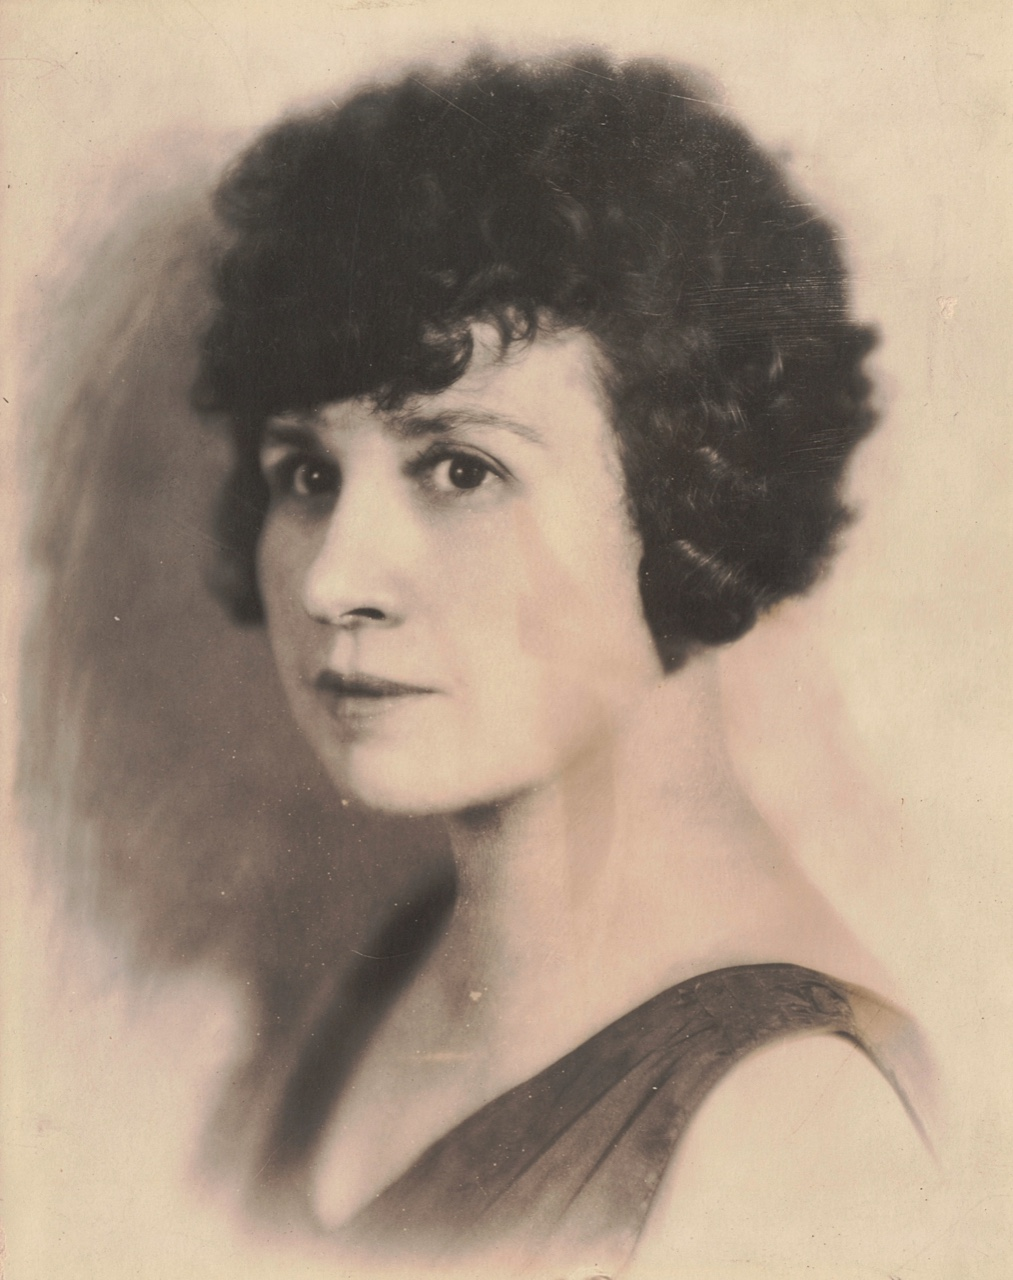 My Grandmother, Norma Carruth